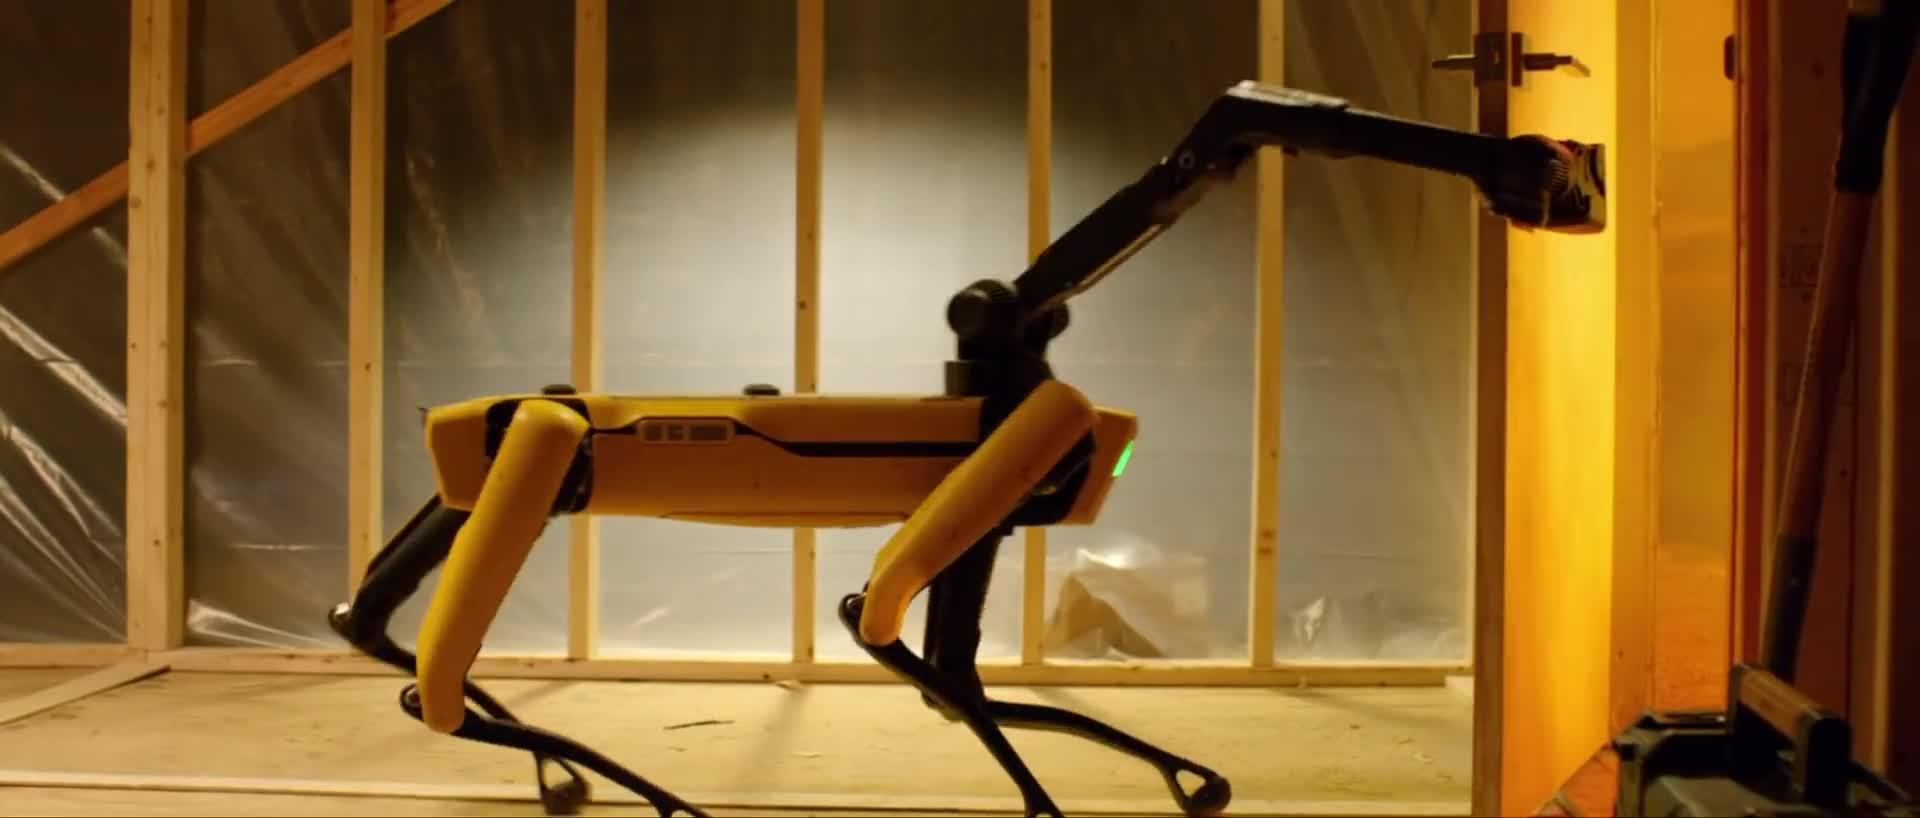 Forschung, Künstliche Intelligenz, Ki, Roboter, Robotik, Spot, Boston Dynamics